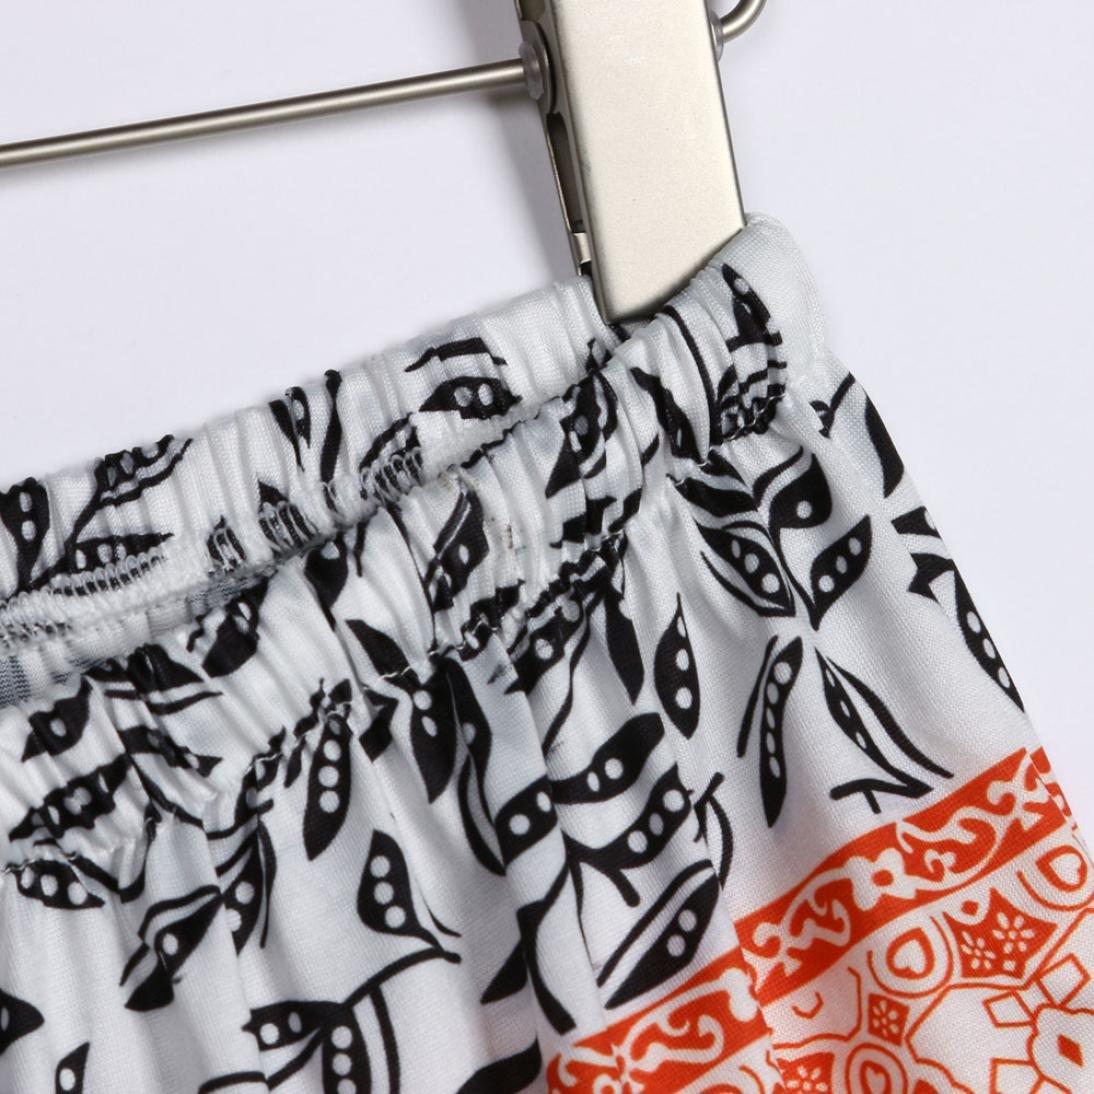 RETUROM-pantalones cortos ♥-♥-♥-pantalones cortos para Mujer, atractivos de las mujeres Pantalones cortos ocasionales de verano Pantalones cortos de ...